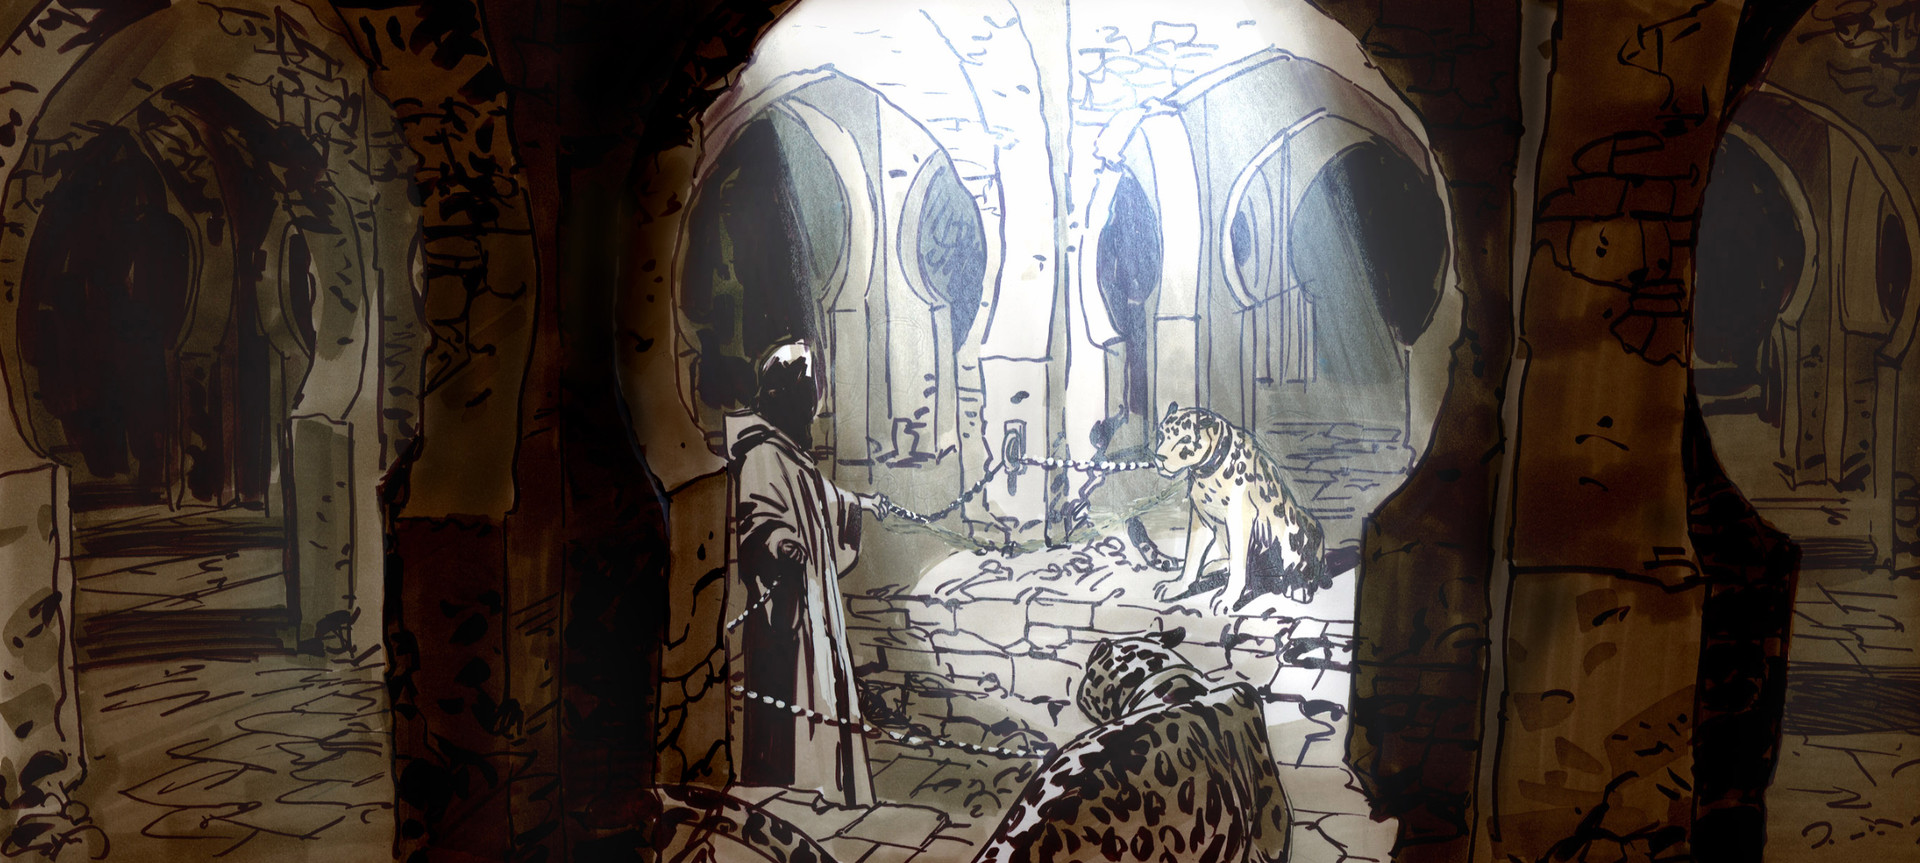 Rodolfo damaggio cistern 5